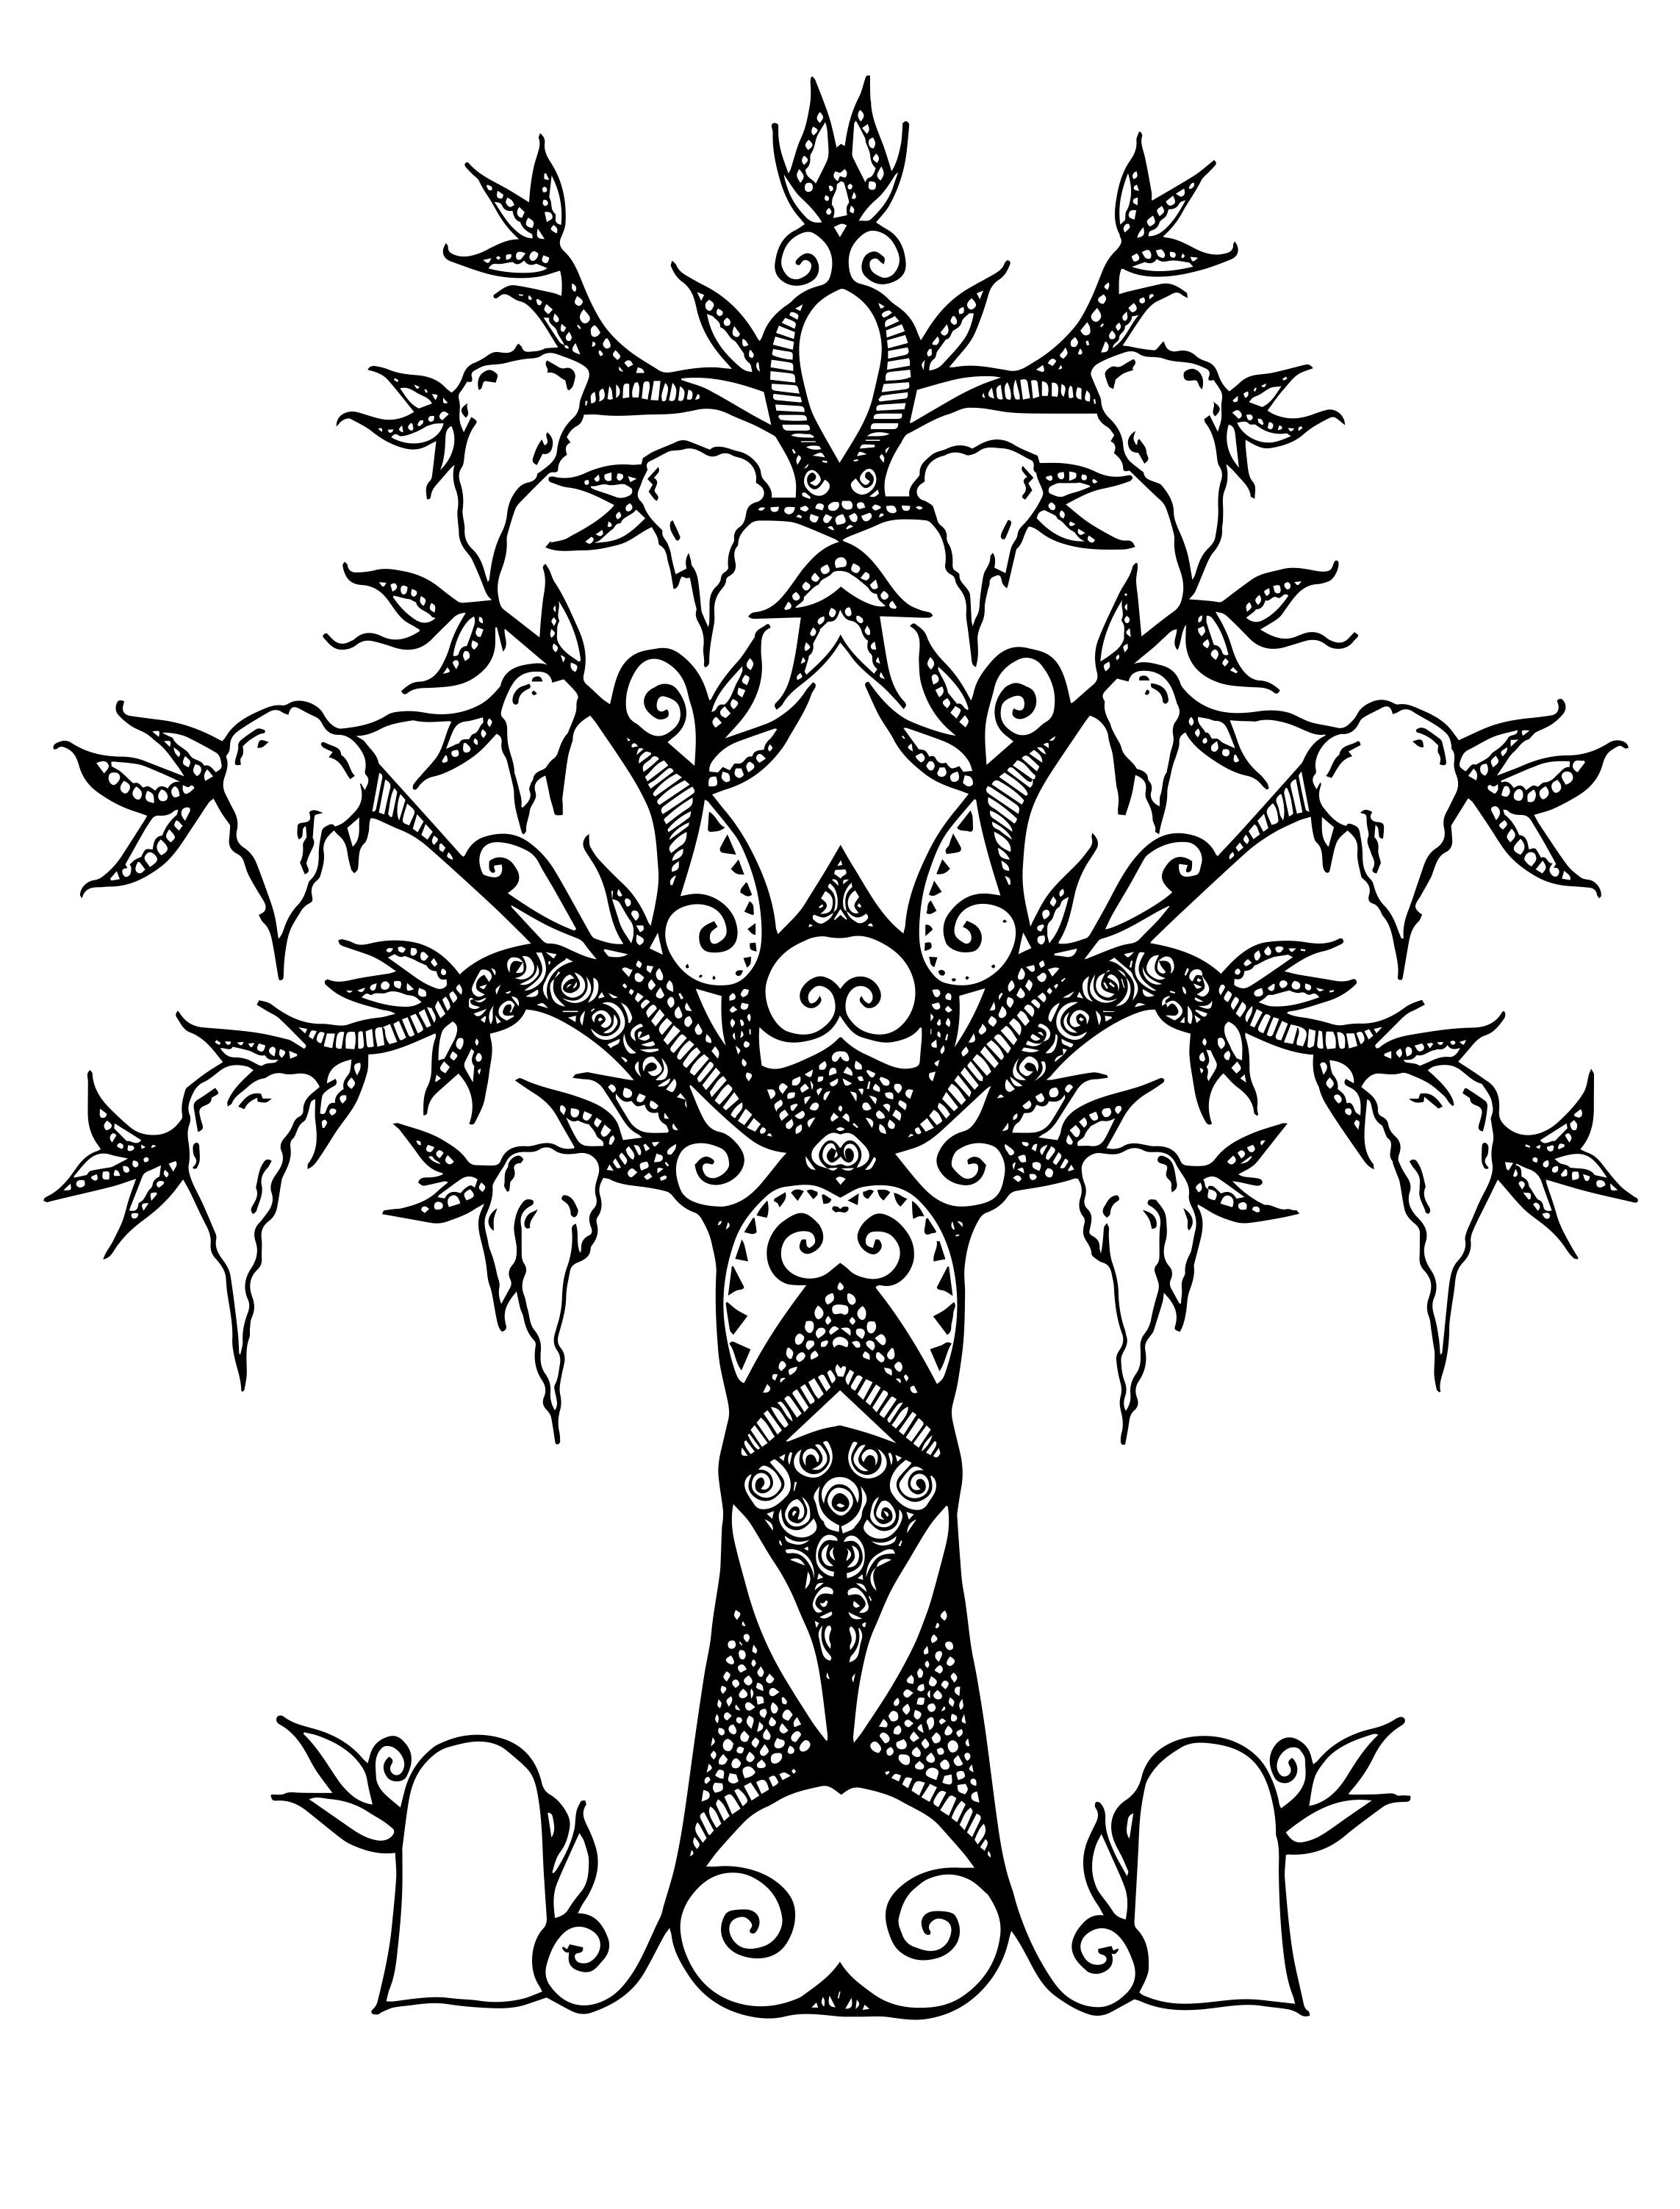 2286x3006 Another Vector Spanish Moss Tree Spot Illustration Olivia Linn